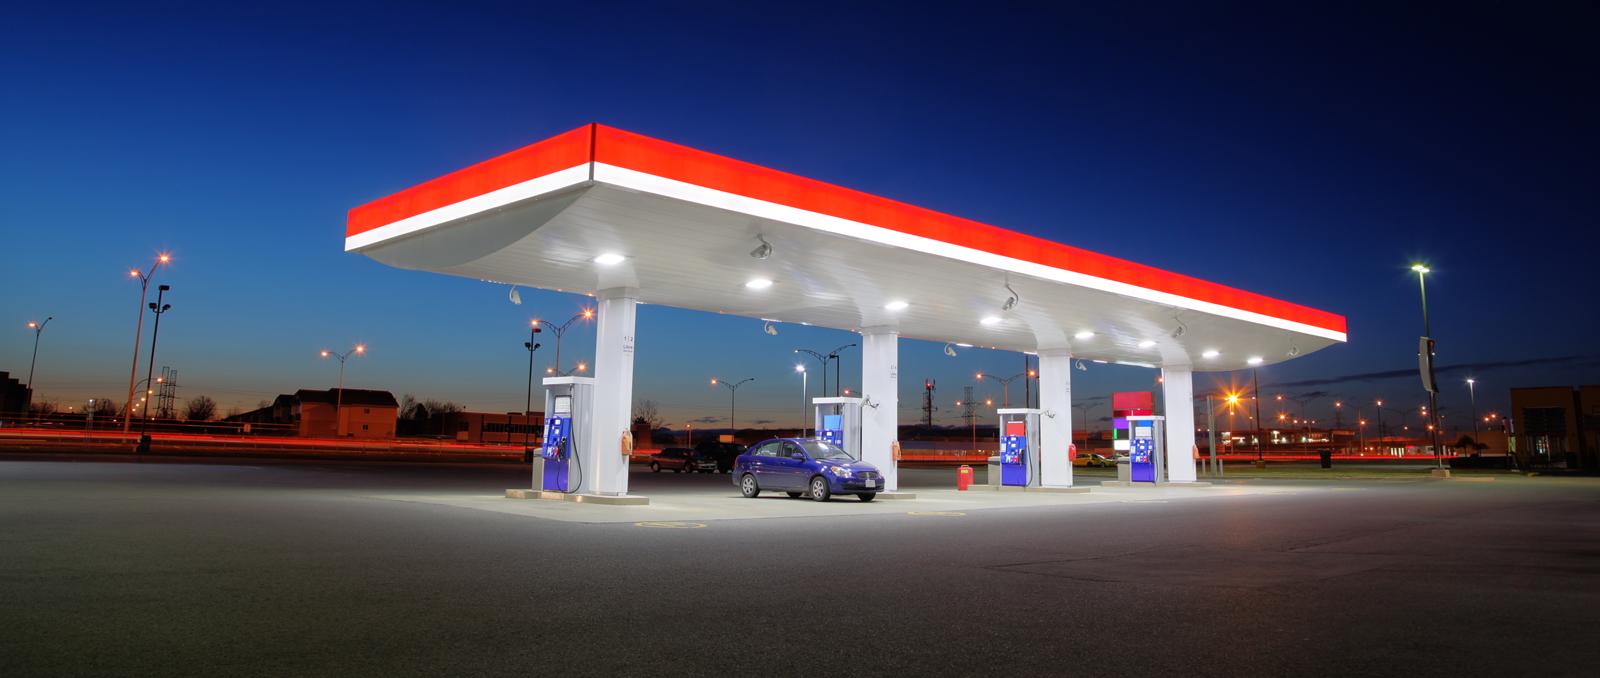 petrol-service-station-insurance-sml.jpg